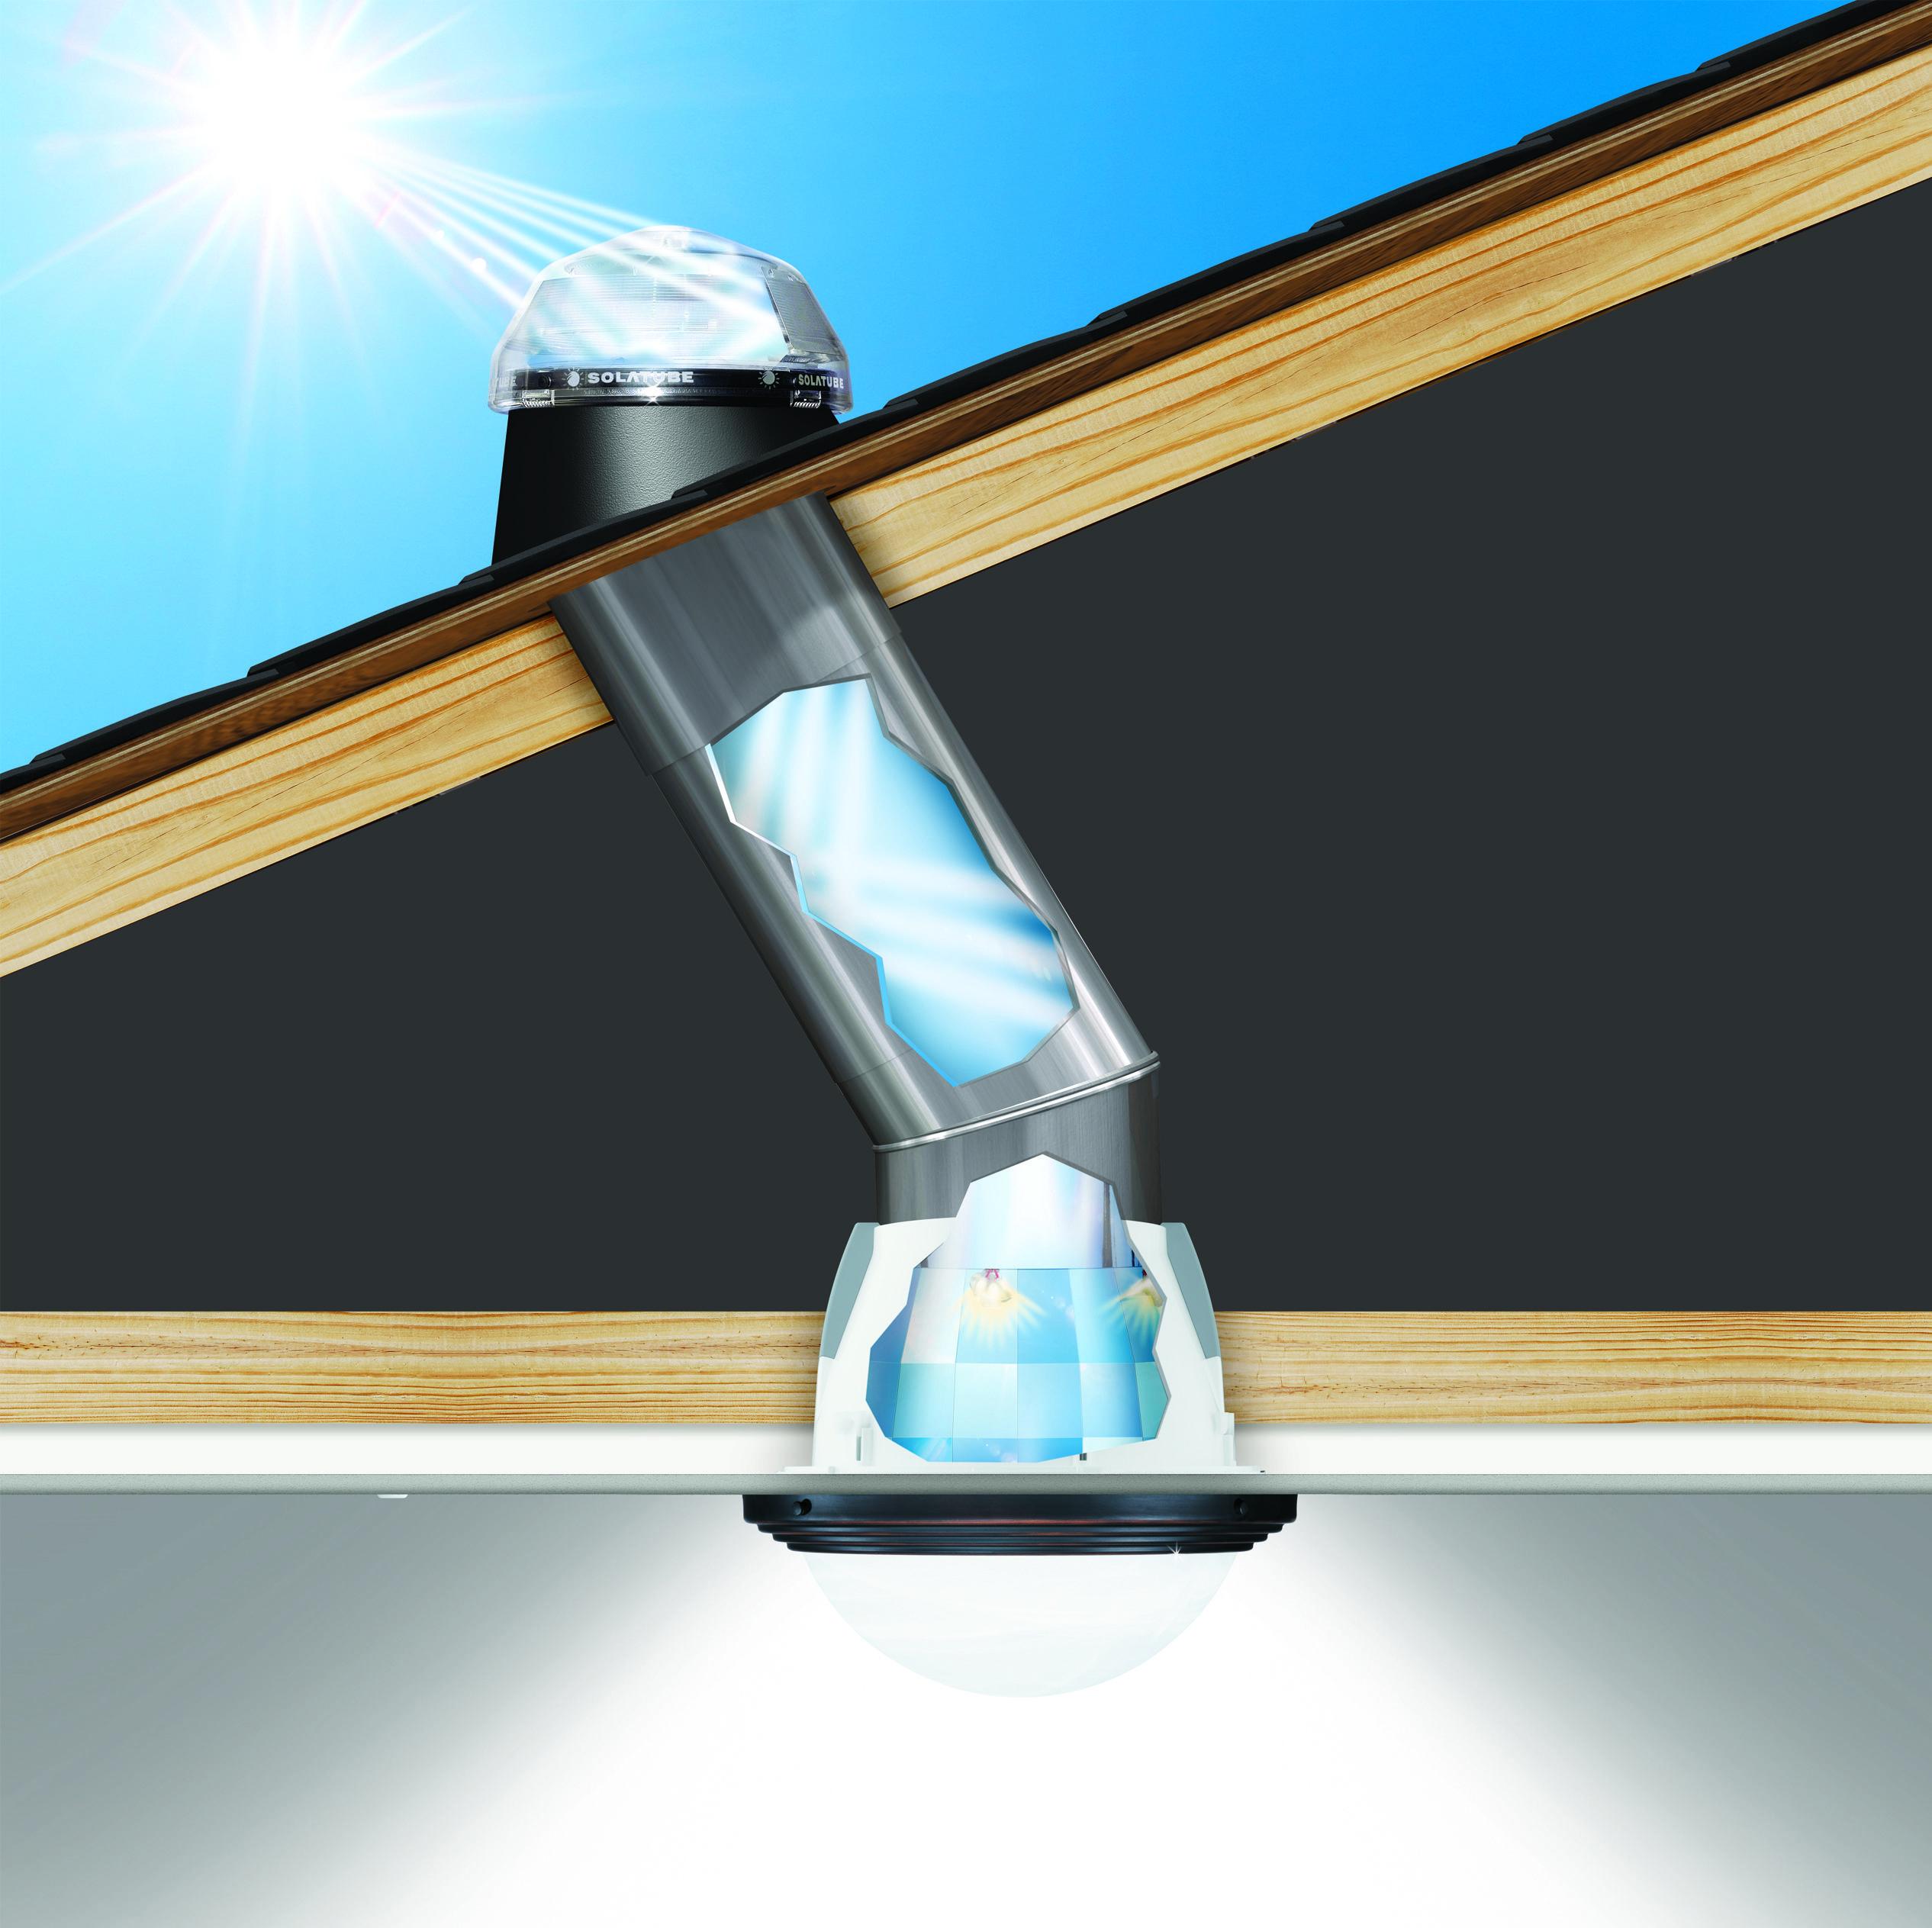 solatube - Google Search | Solar tubes, Solar tube ...